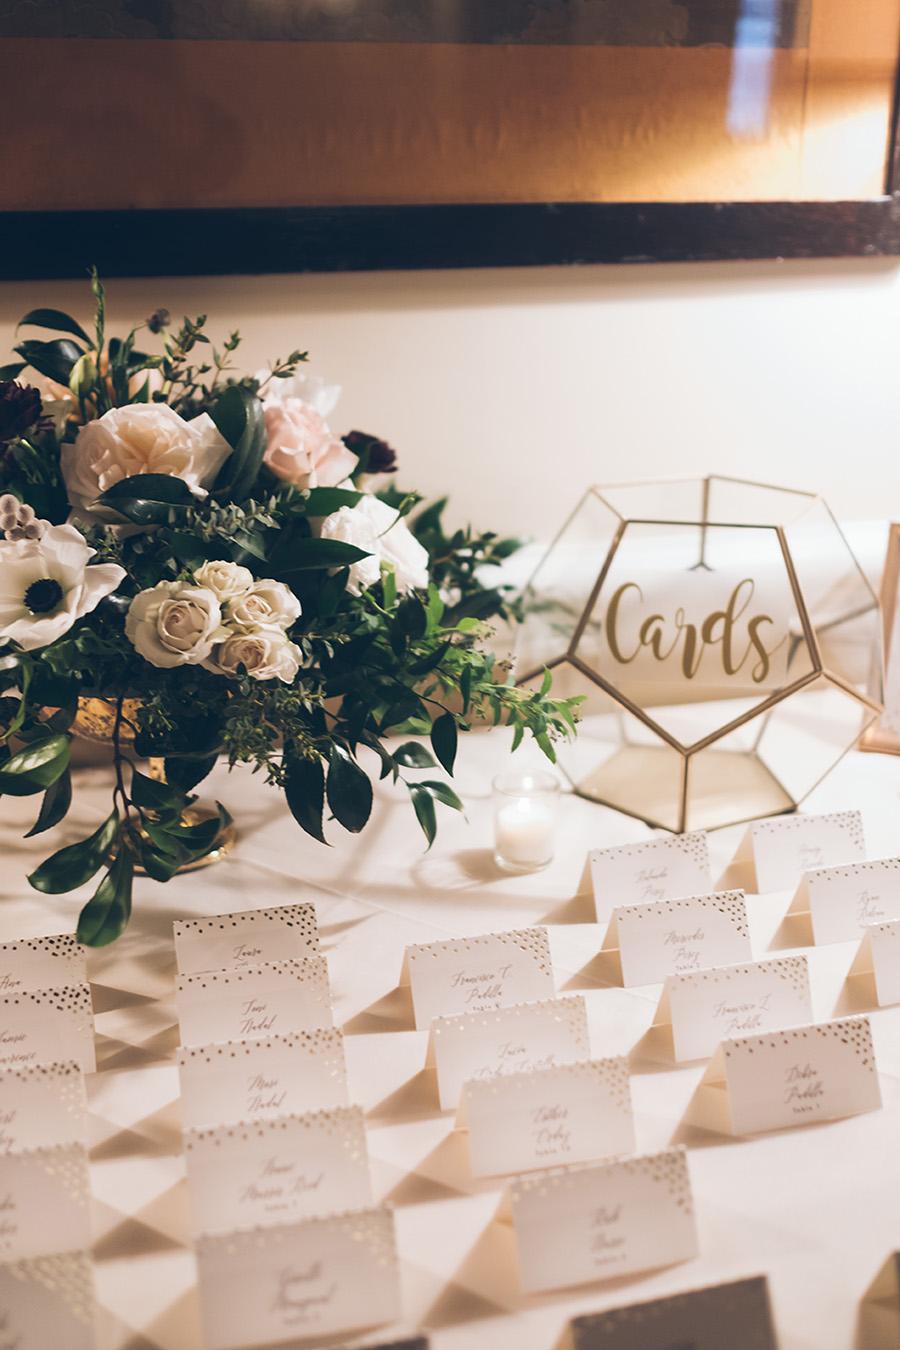 CHARISSE-AARON-NYC-WEDDING-CYNTHIACHUNG-DETAILS-0094.jpg